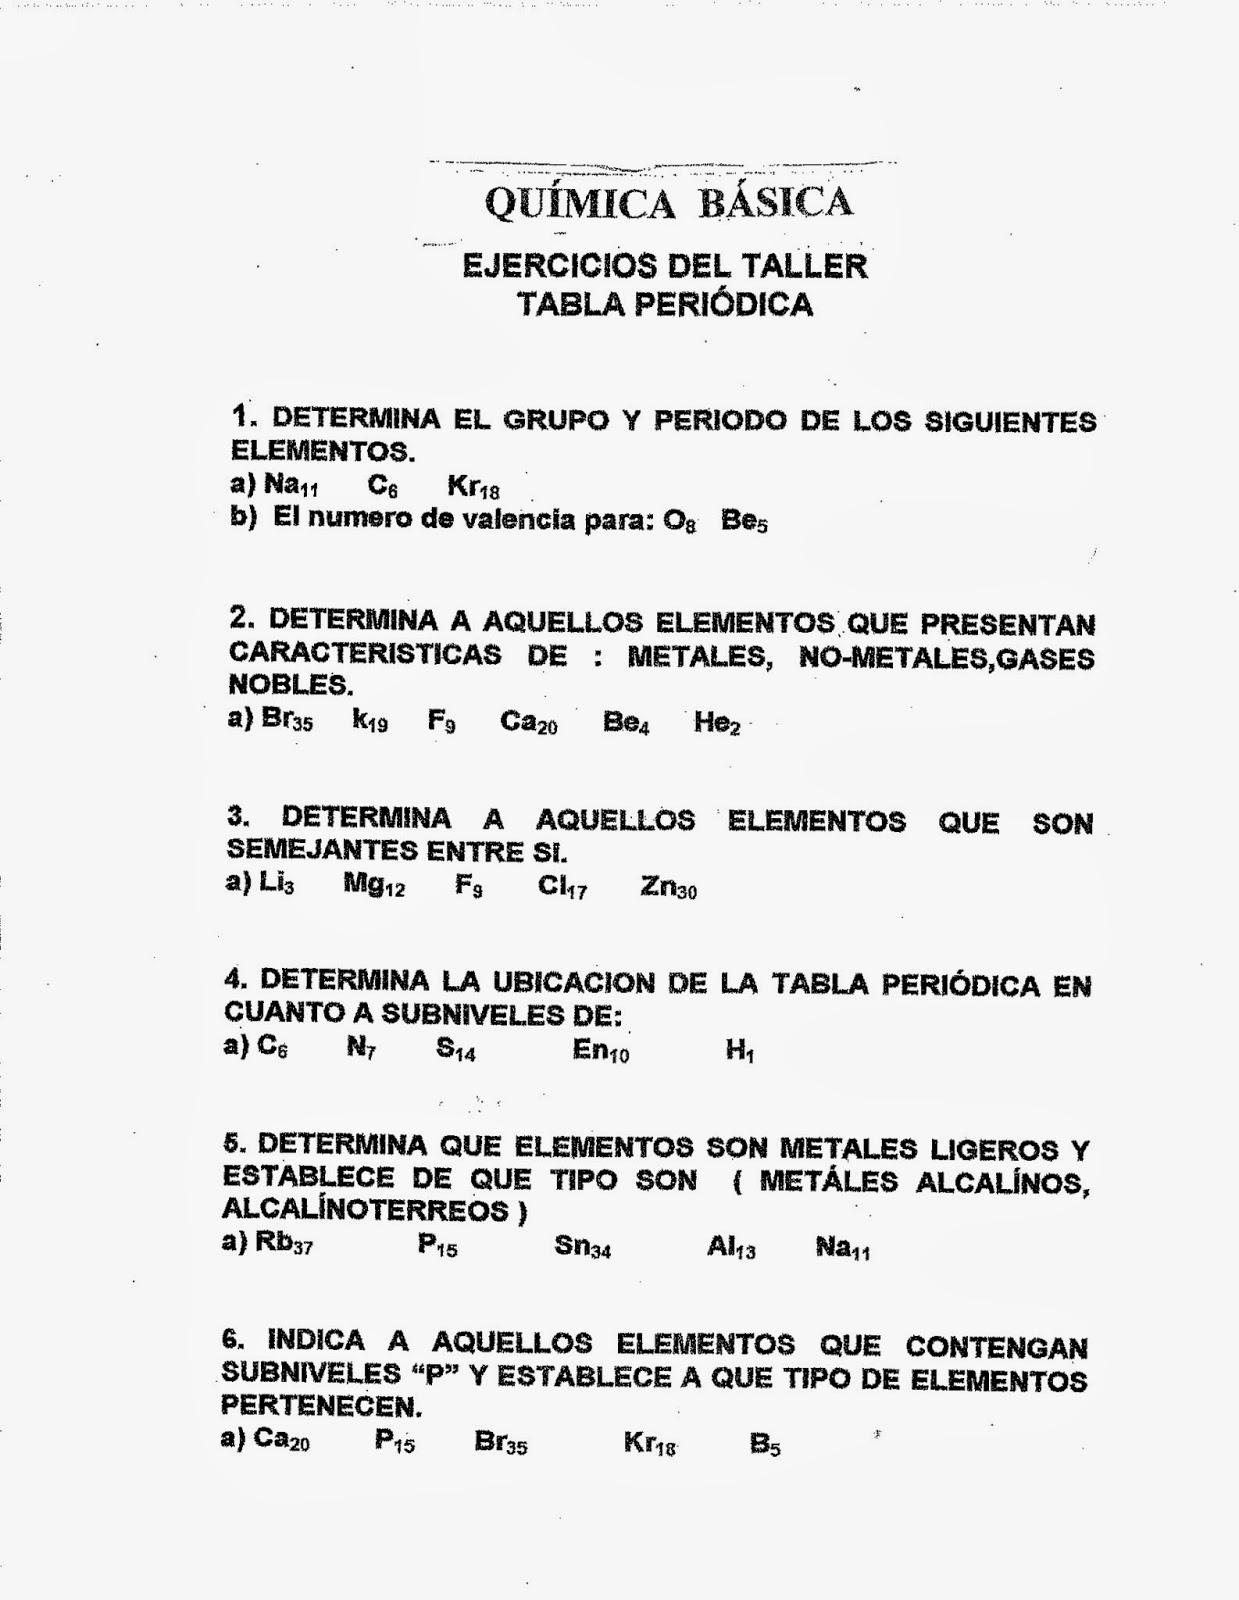 Quimica basica 2015 ejercicios de tabla periodica ejercicios de tabla periodica urtaz Image collections